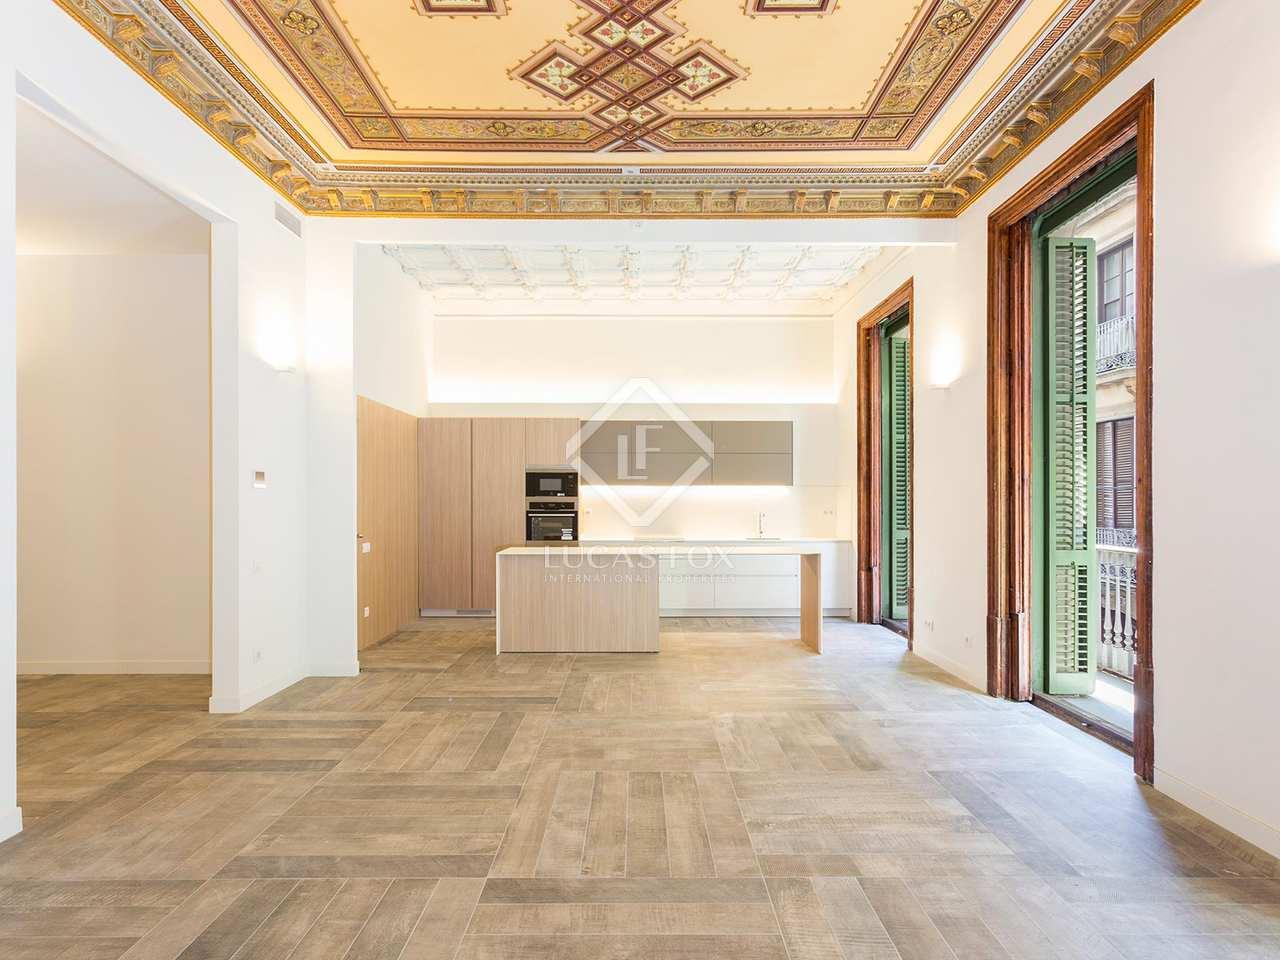 Appartement de 175m a vendre g tico barcelone - Acheter appartement a barcelone ...